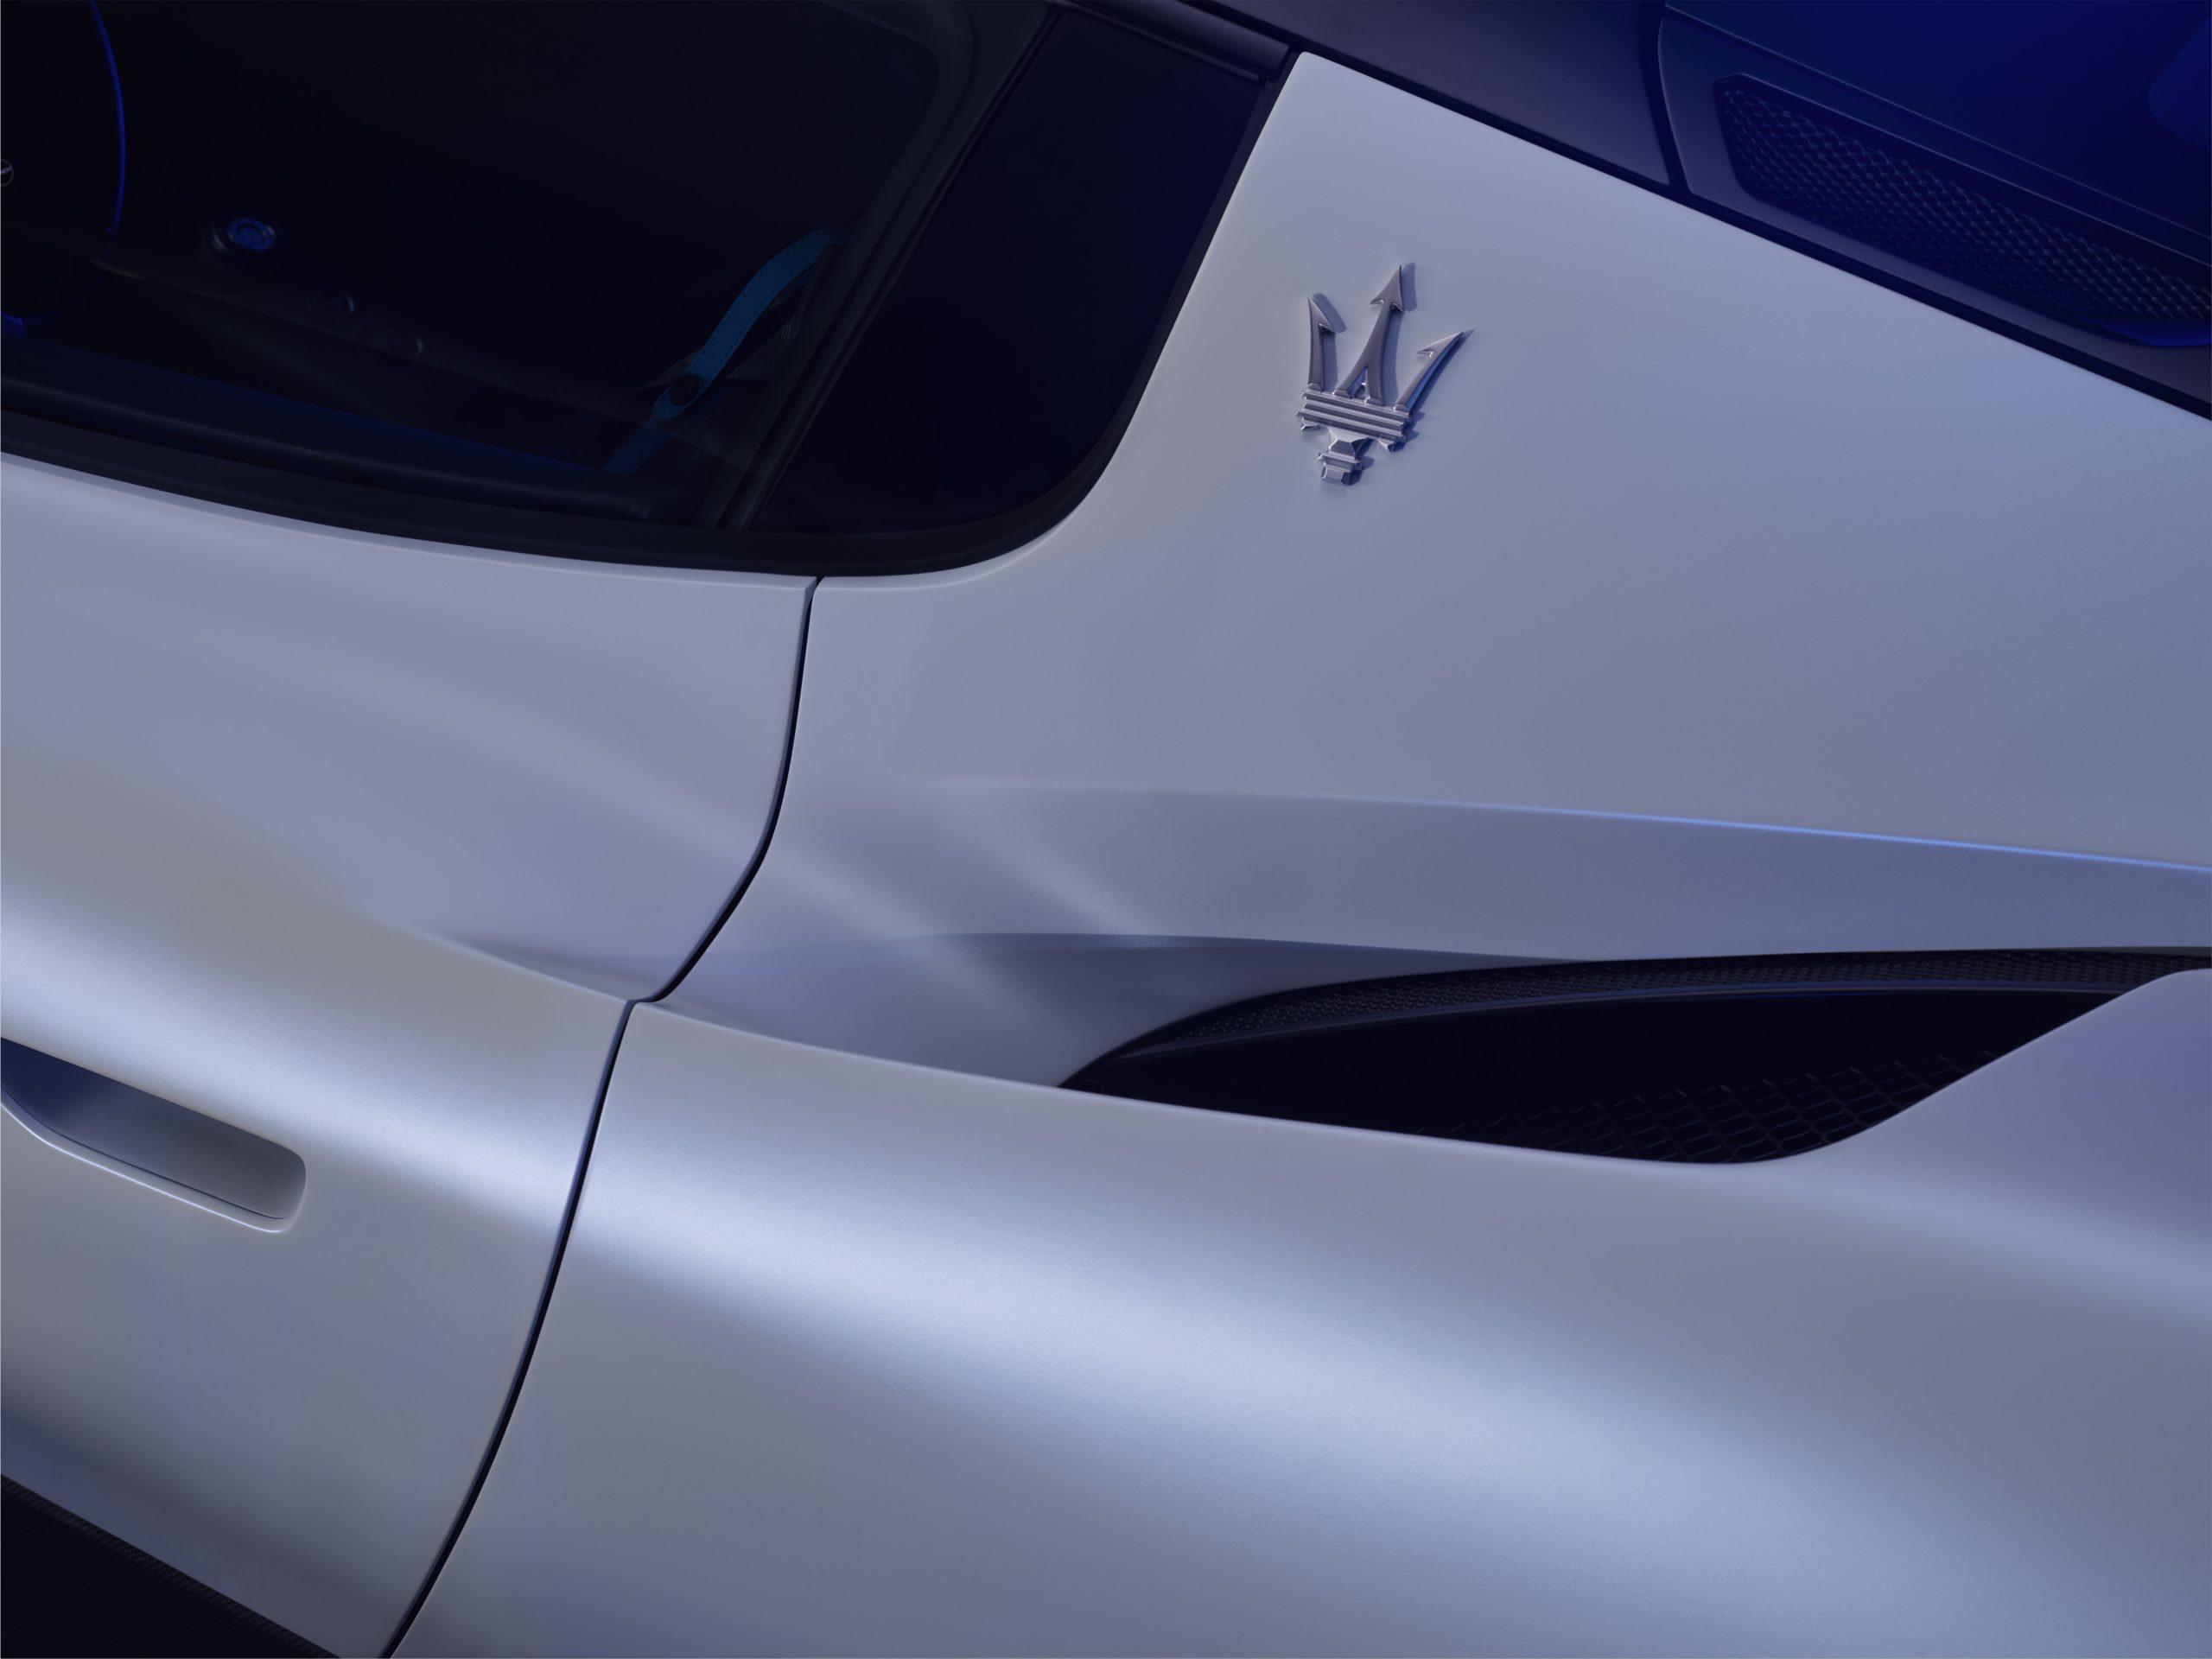 Maserati MC20 trident logo rear scoop